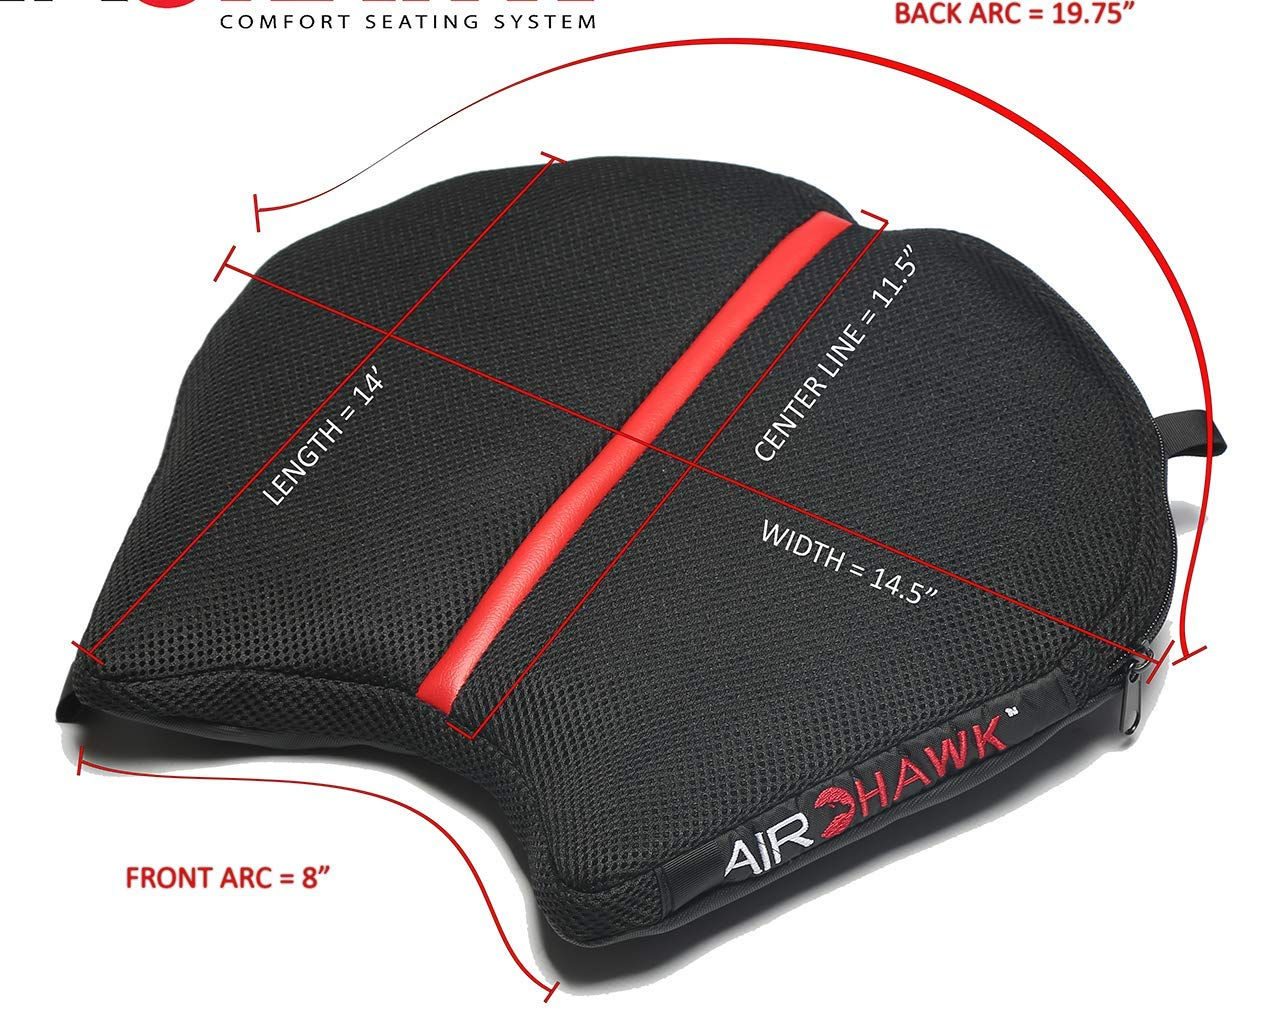 Amazon.com: Airhawk R-REVB Cruiser R - Cojín grande para ...